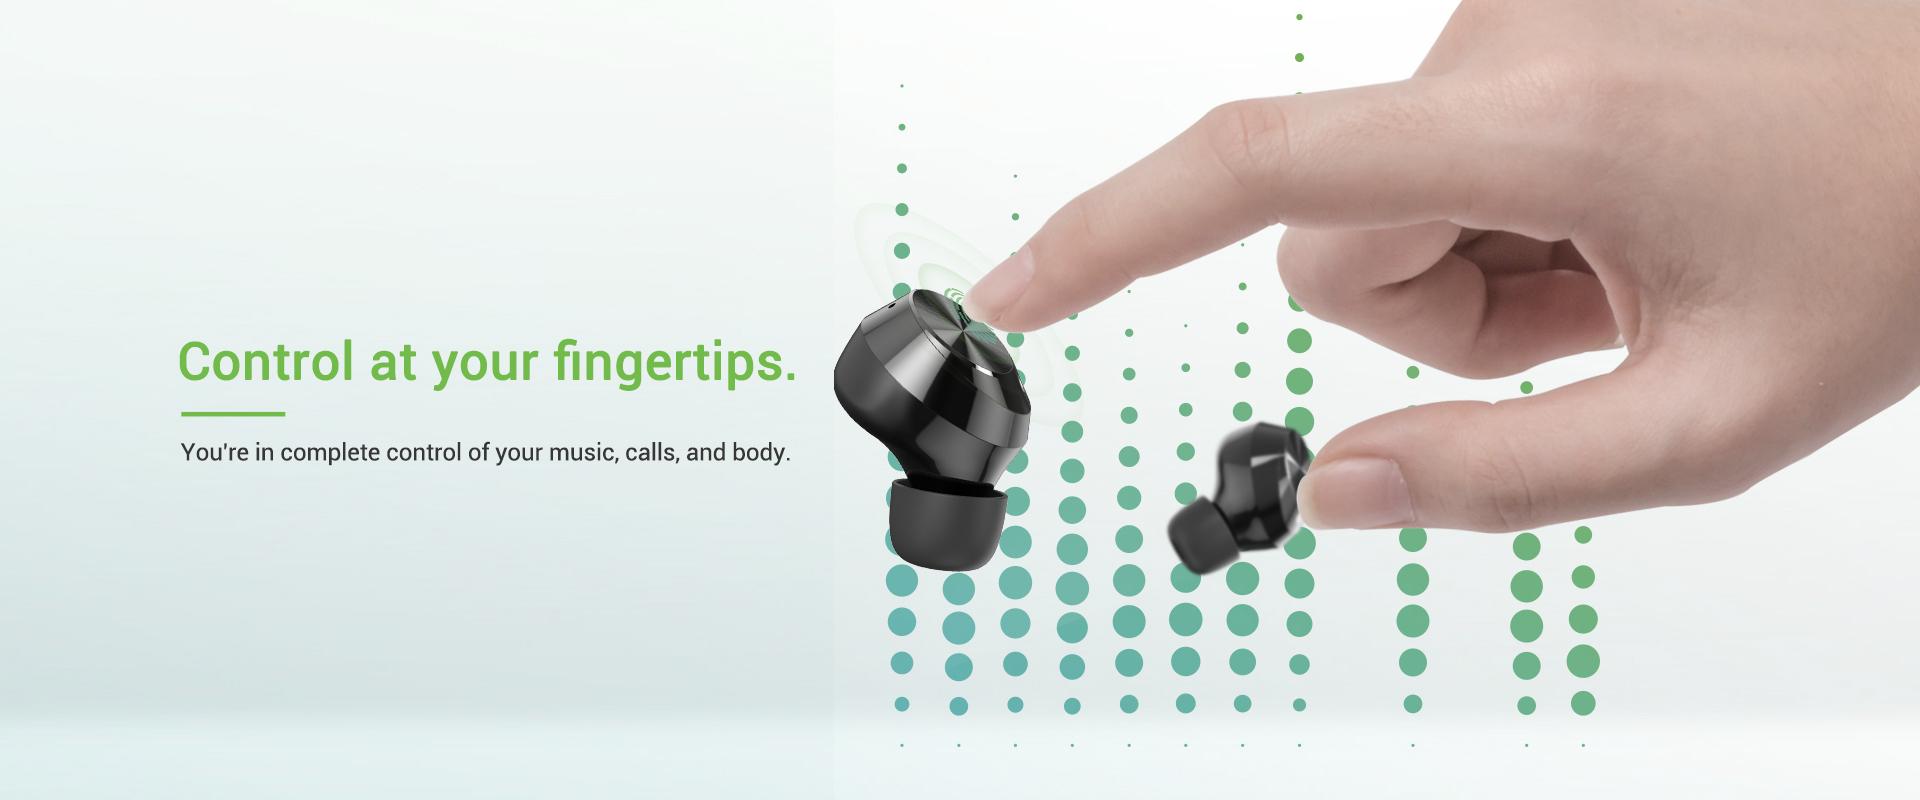 wireless earbuds controls fingertips